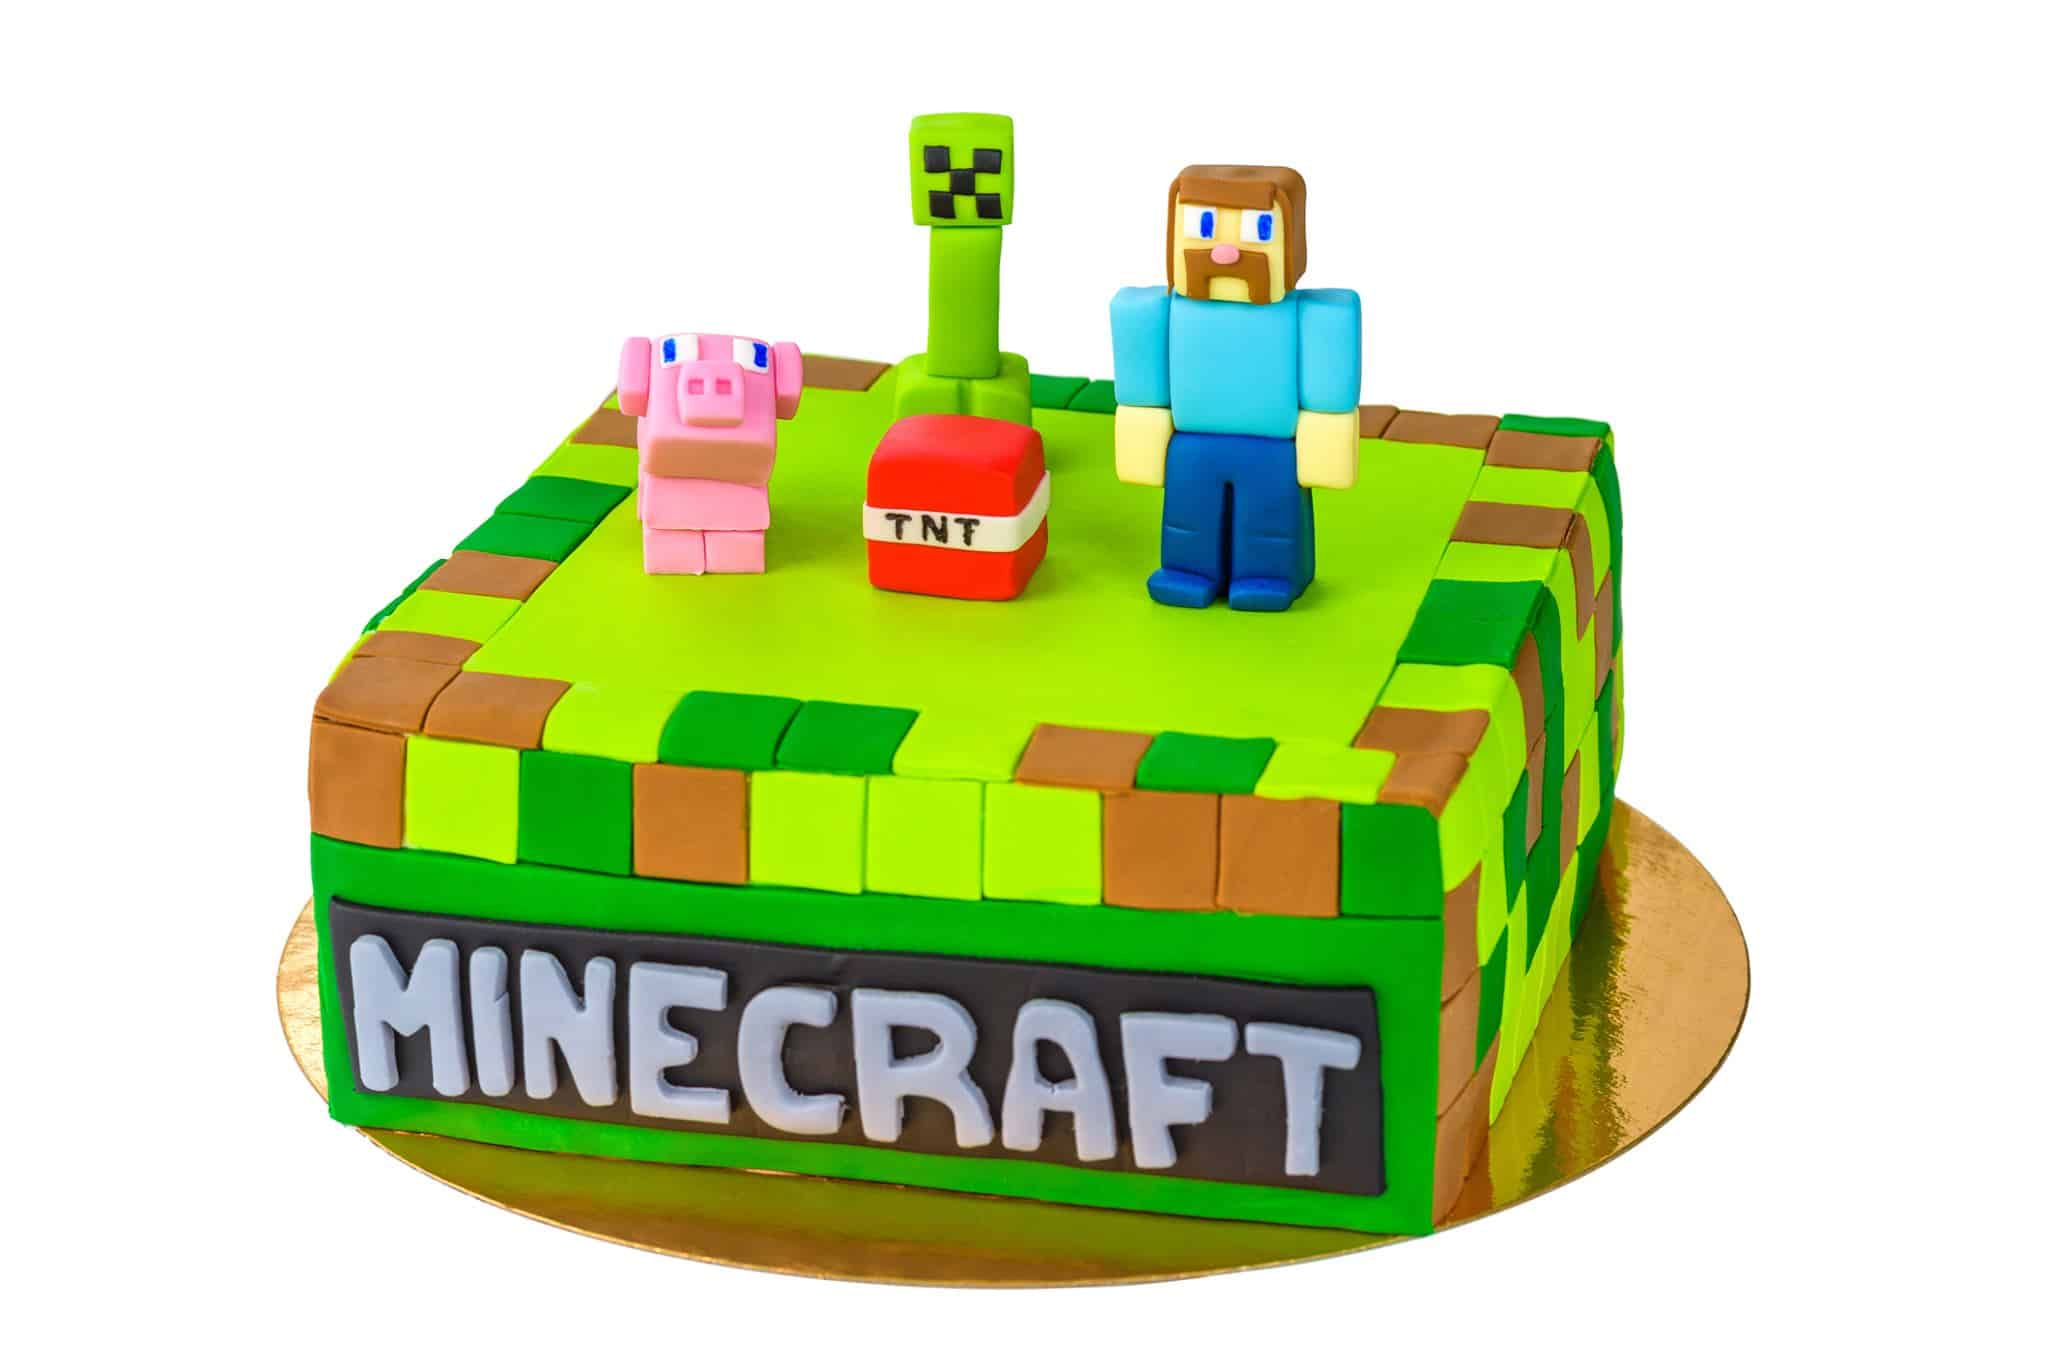 How to Downgrade Minecraft